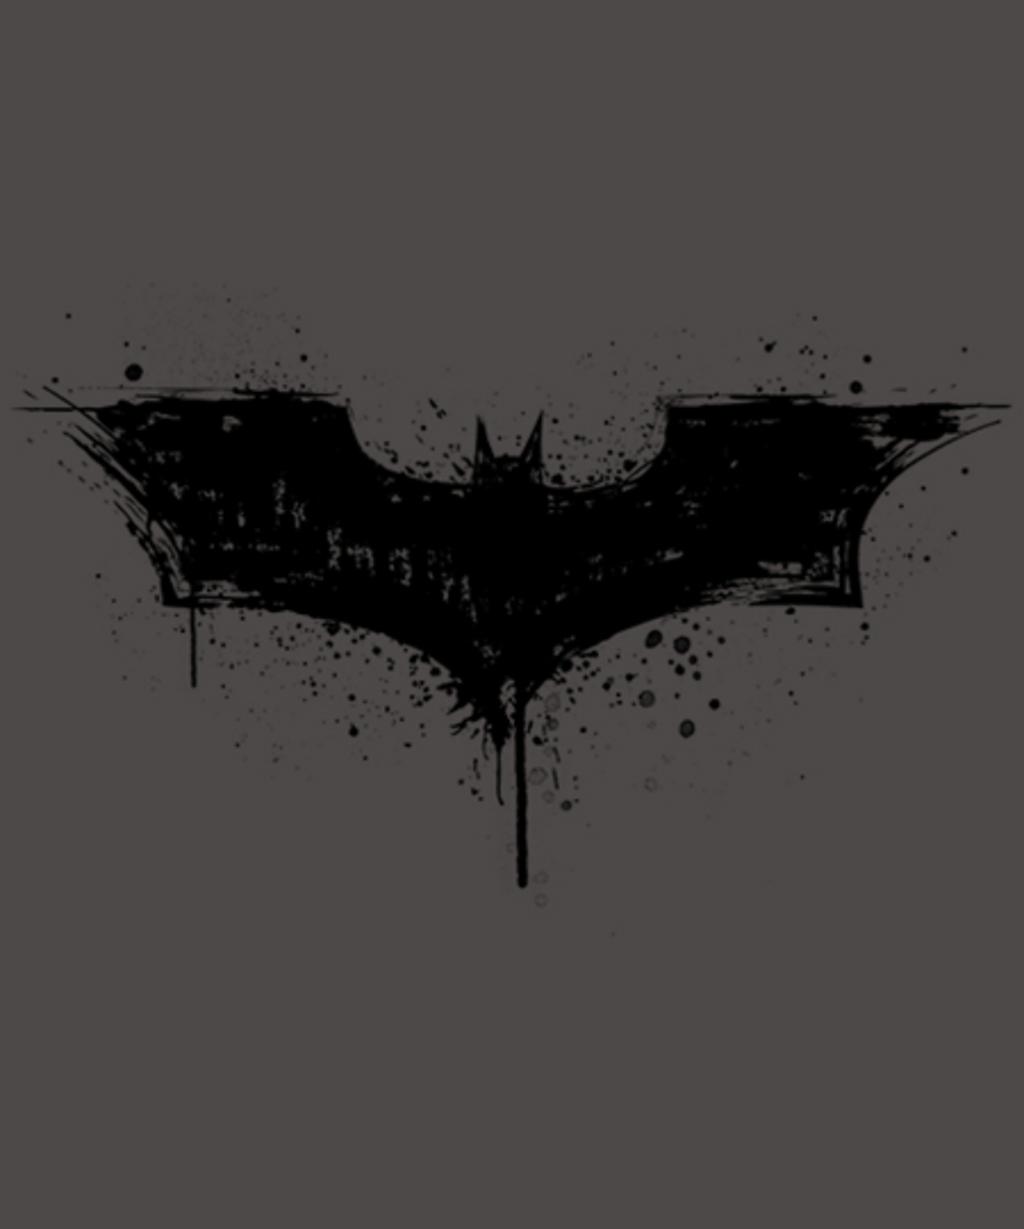 Qwertee: I am the Dark Knight